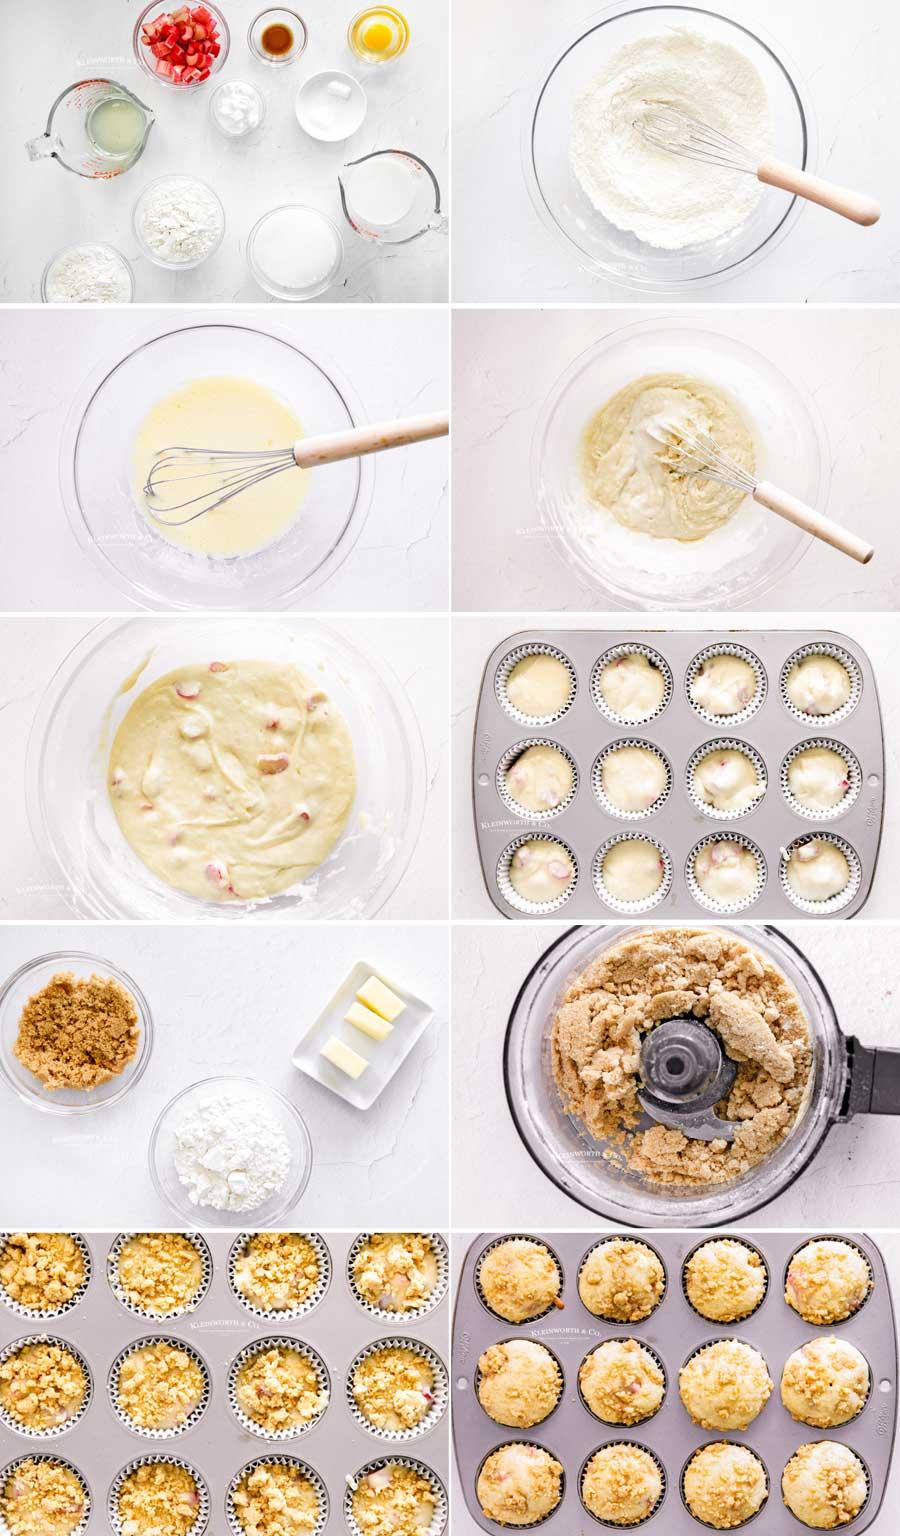 how to make Rhubarb Muffins